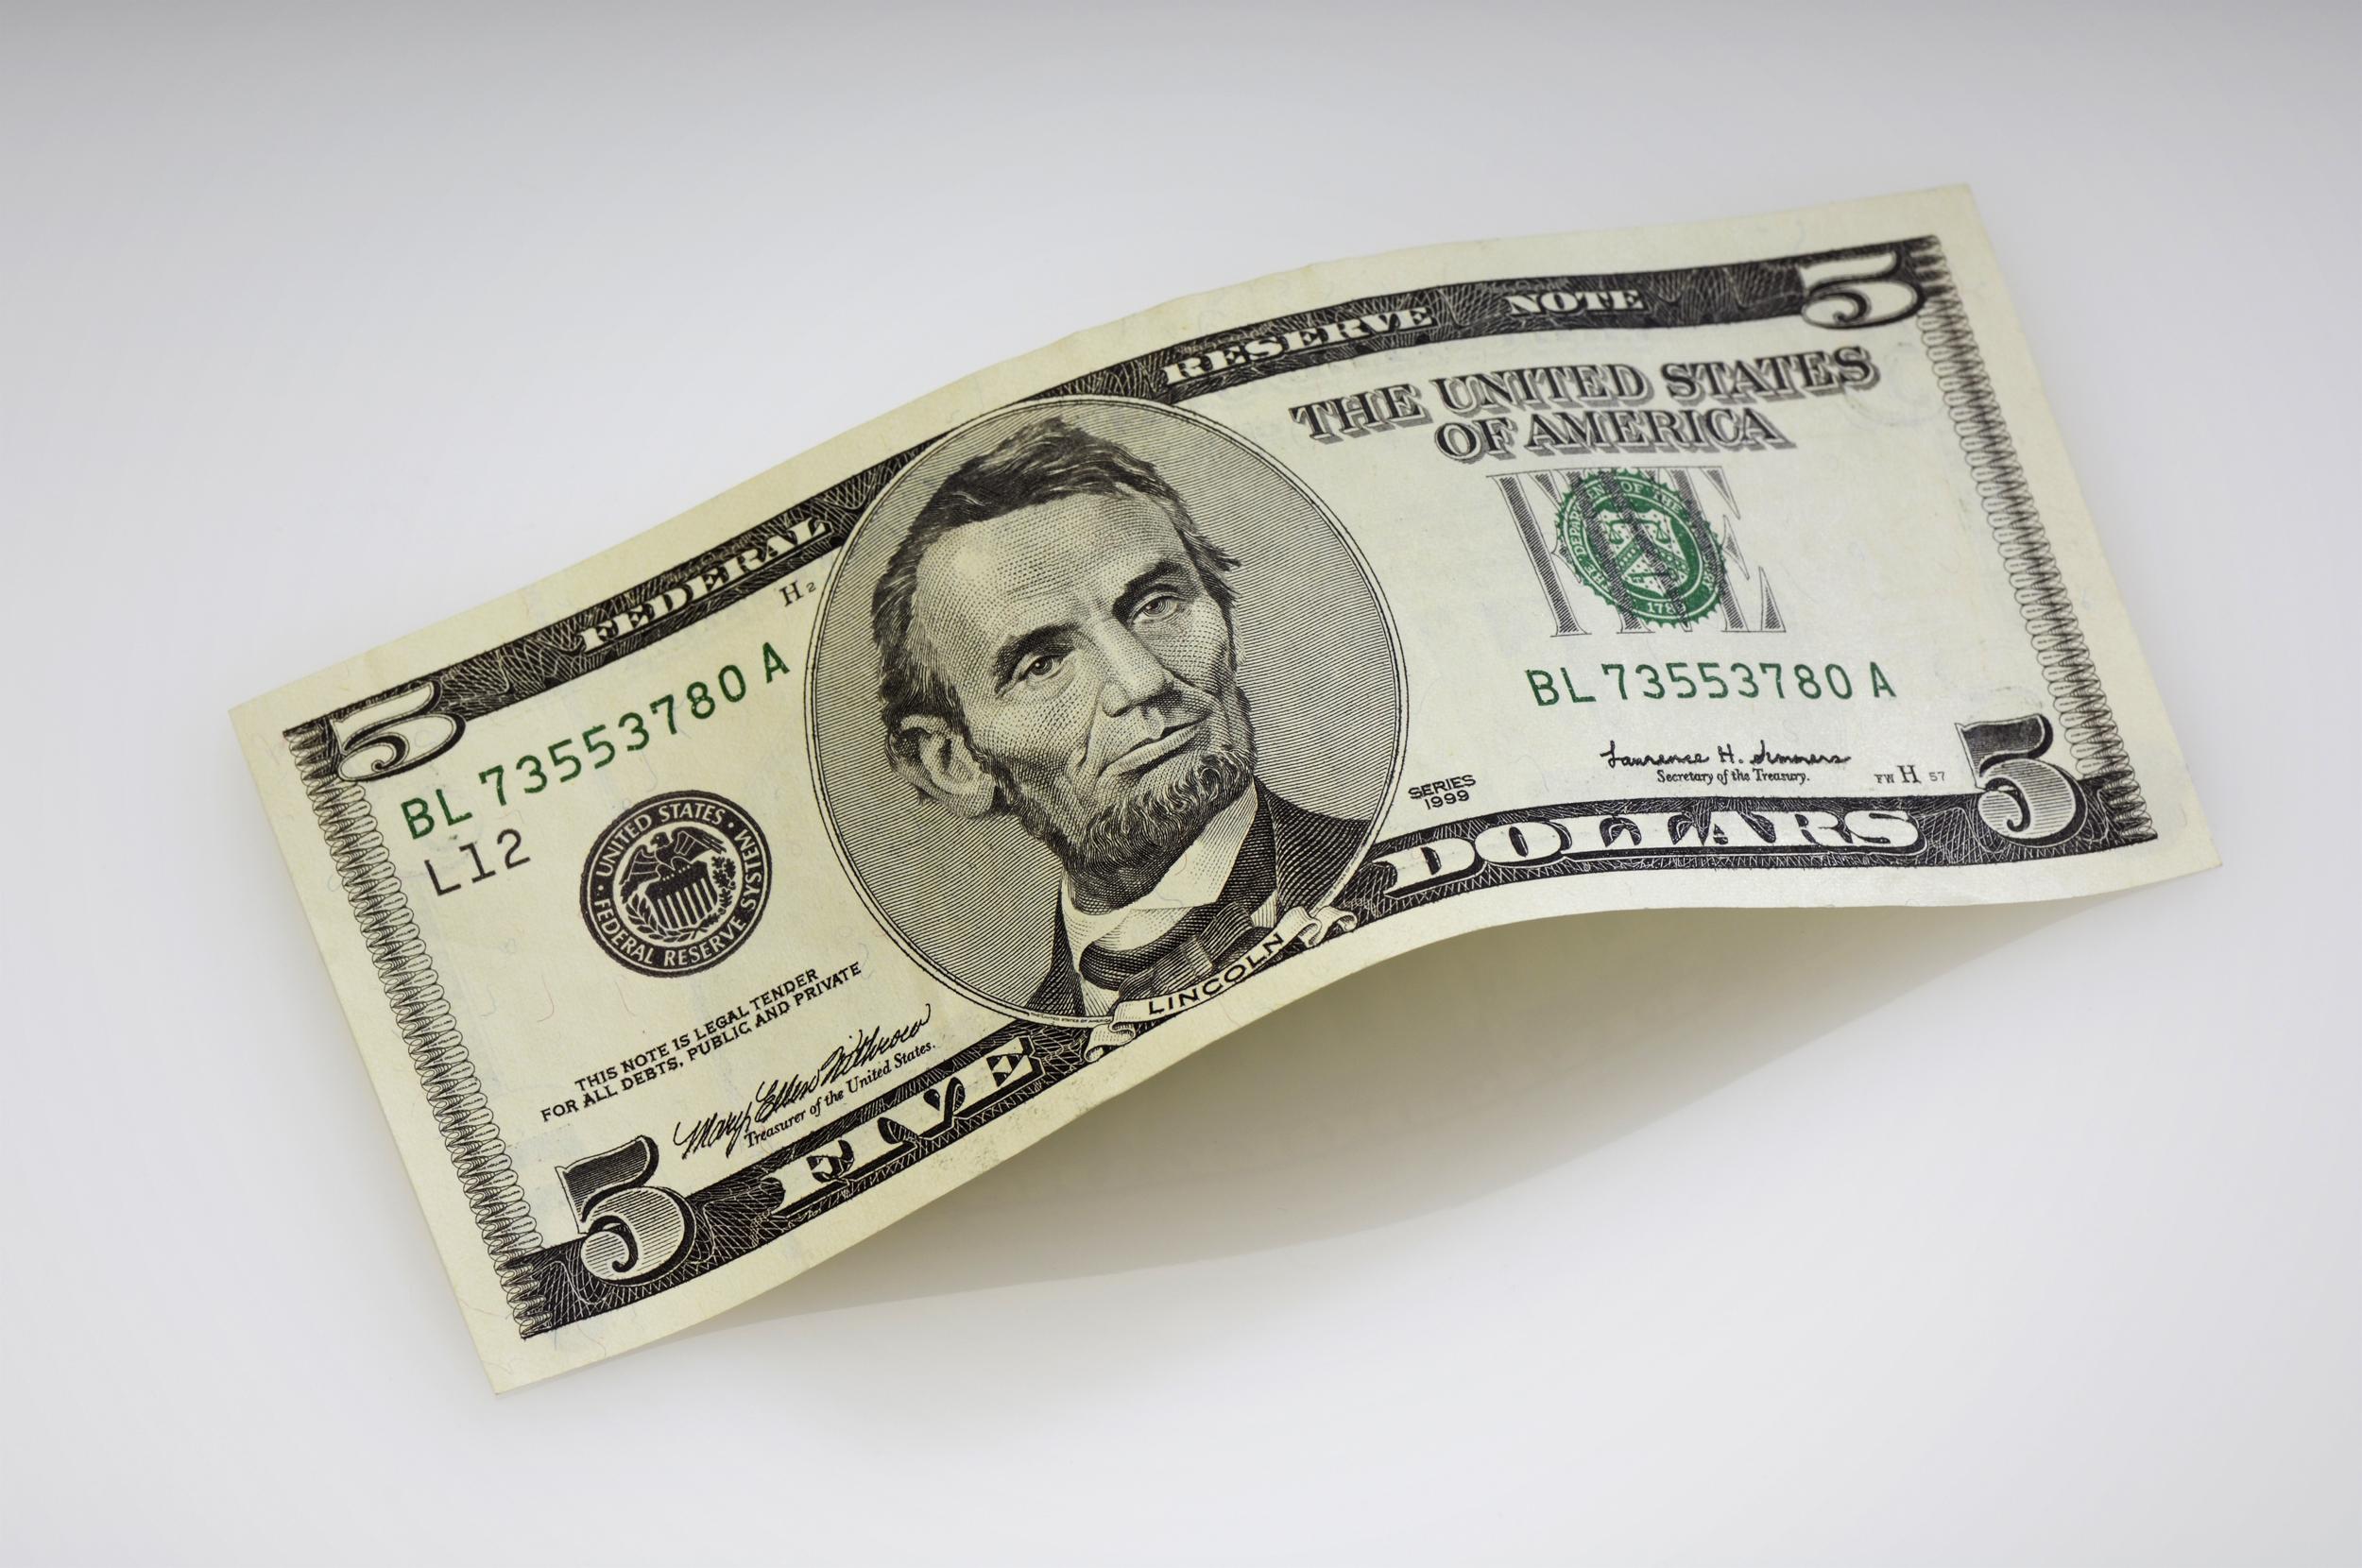 Saved Thousands By Pocketing 5 Bills